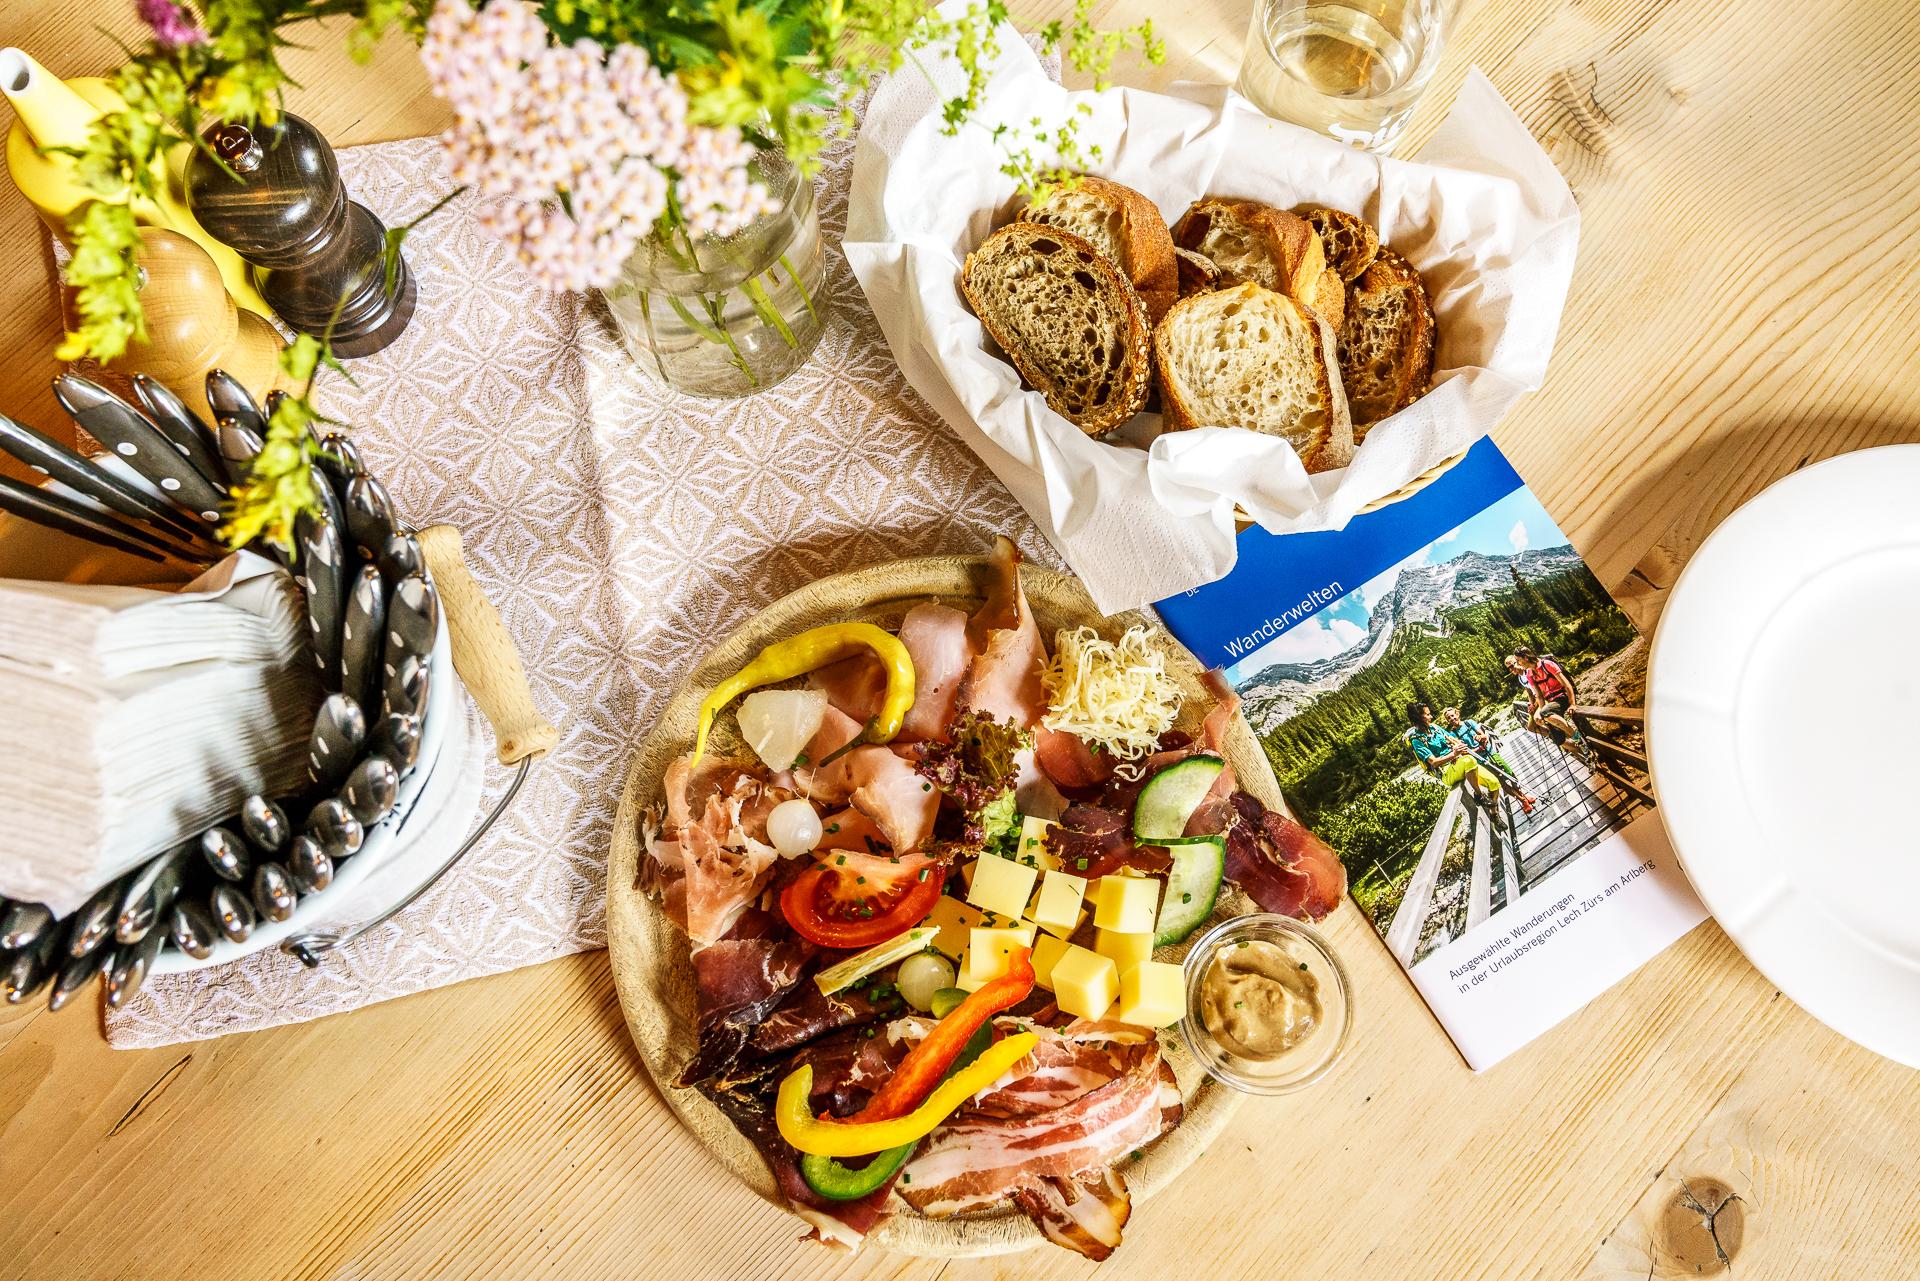 Jause-Restaurant-Aelple-Lech